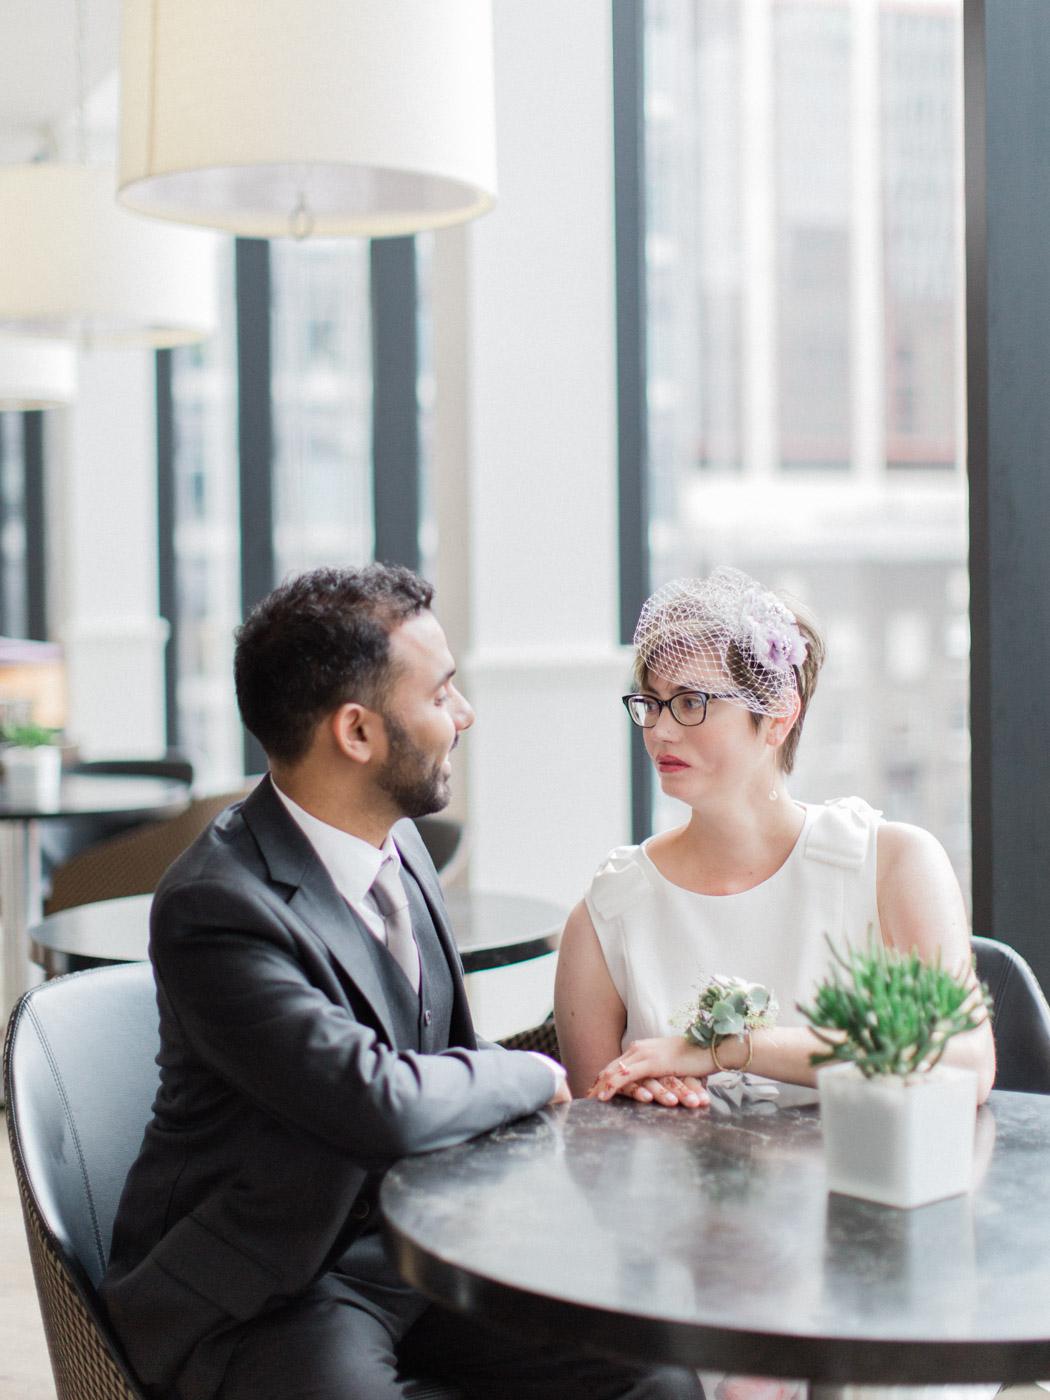 Toronto-wedding-photographer-intimate-restaurant-elopement-chase-oyster-downtown2.jpg